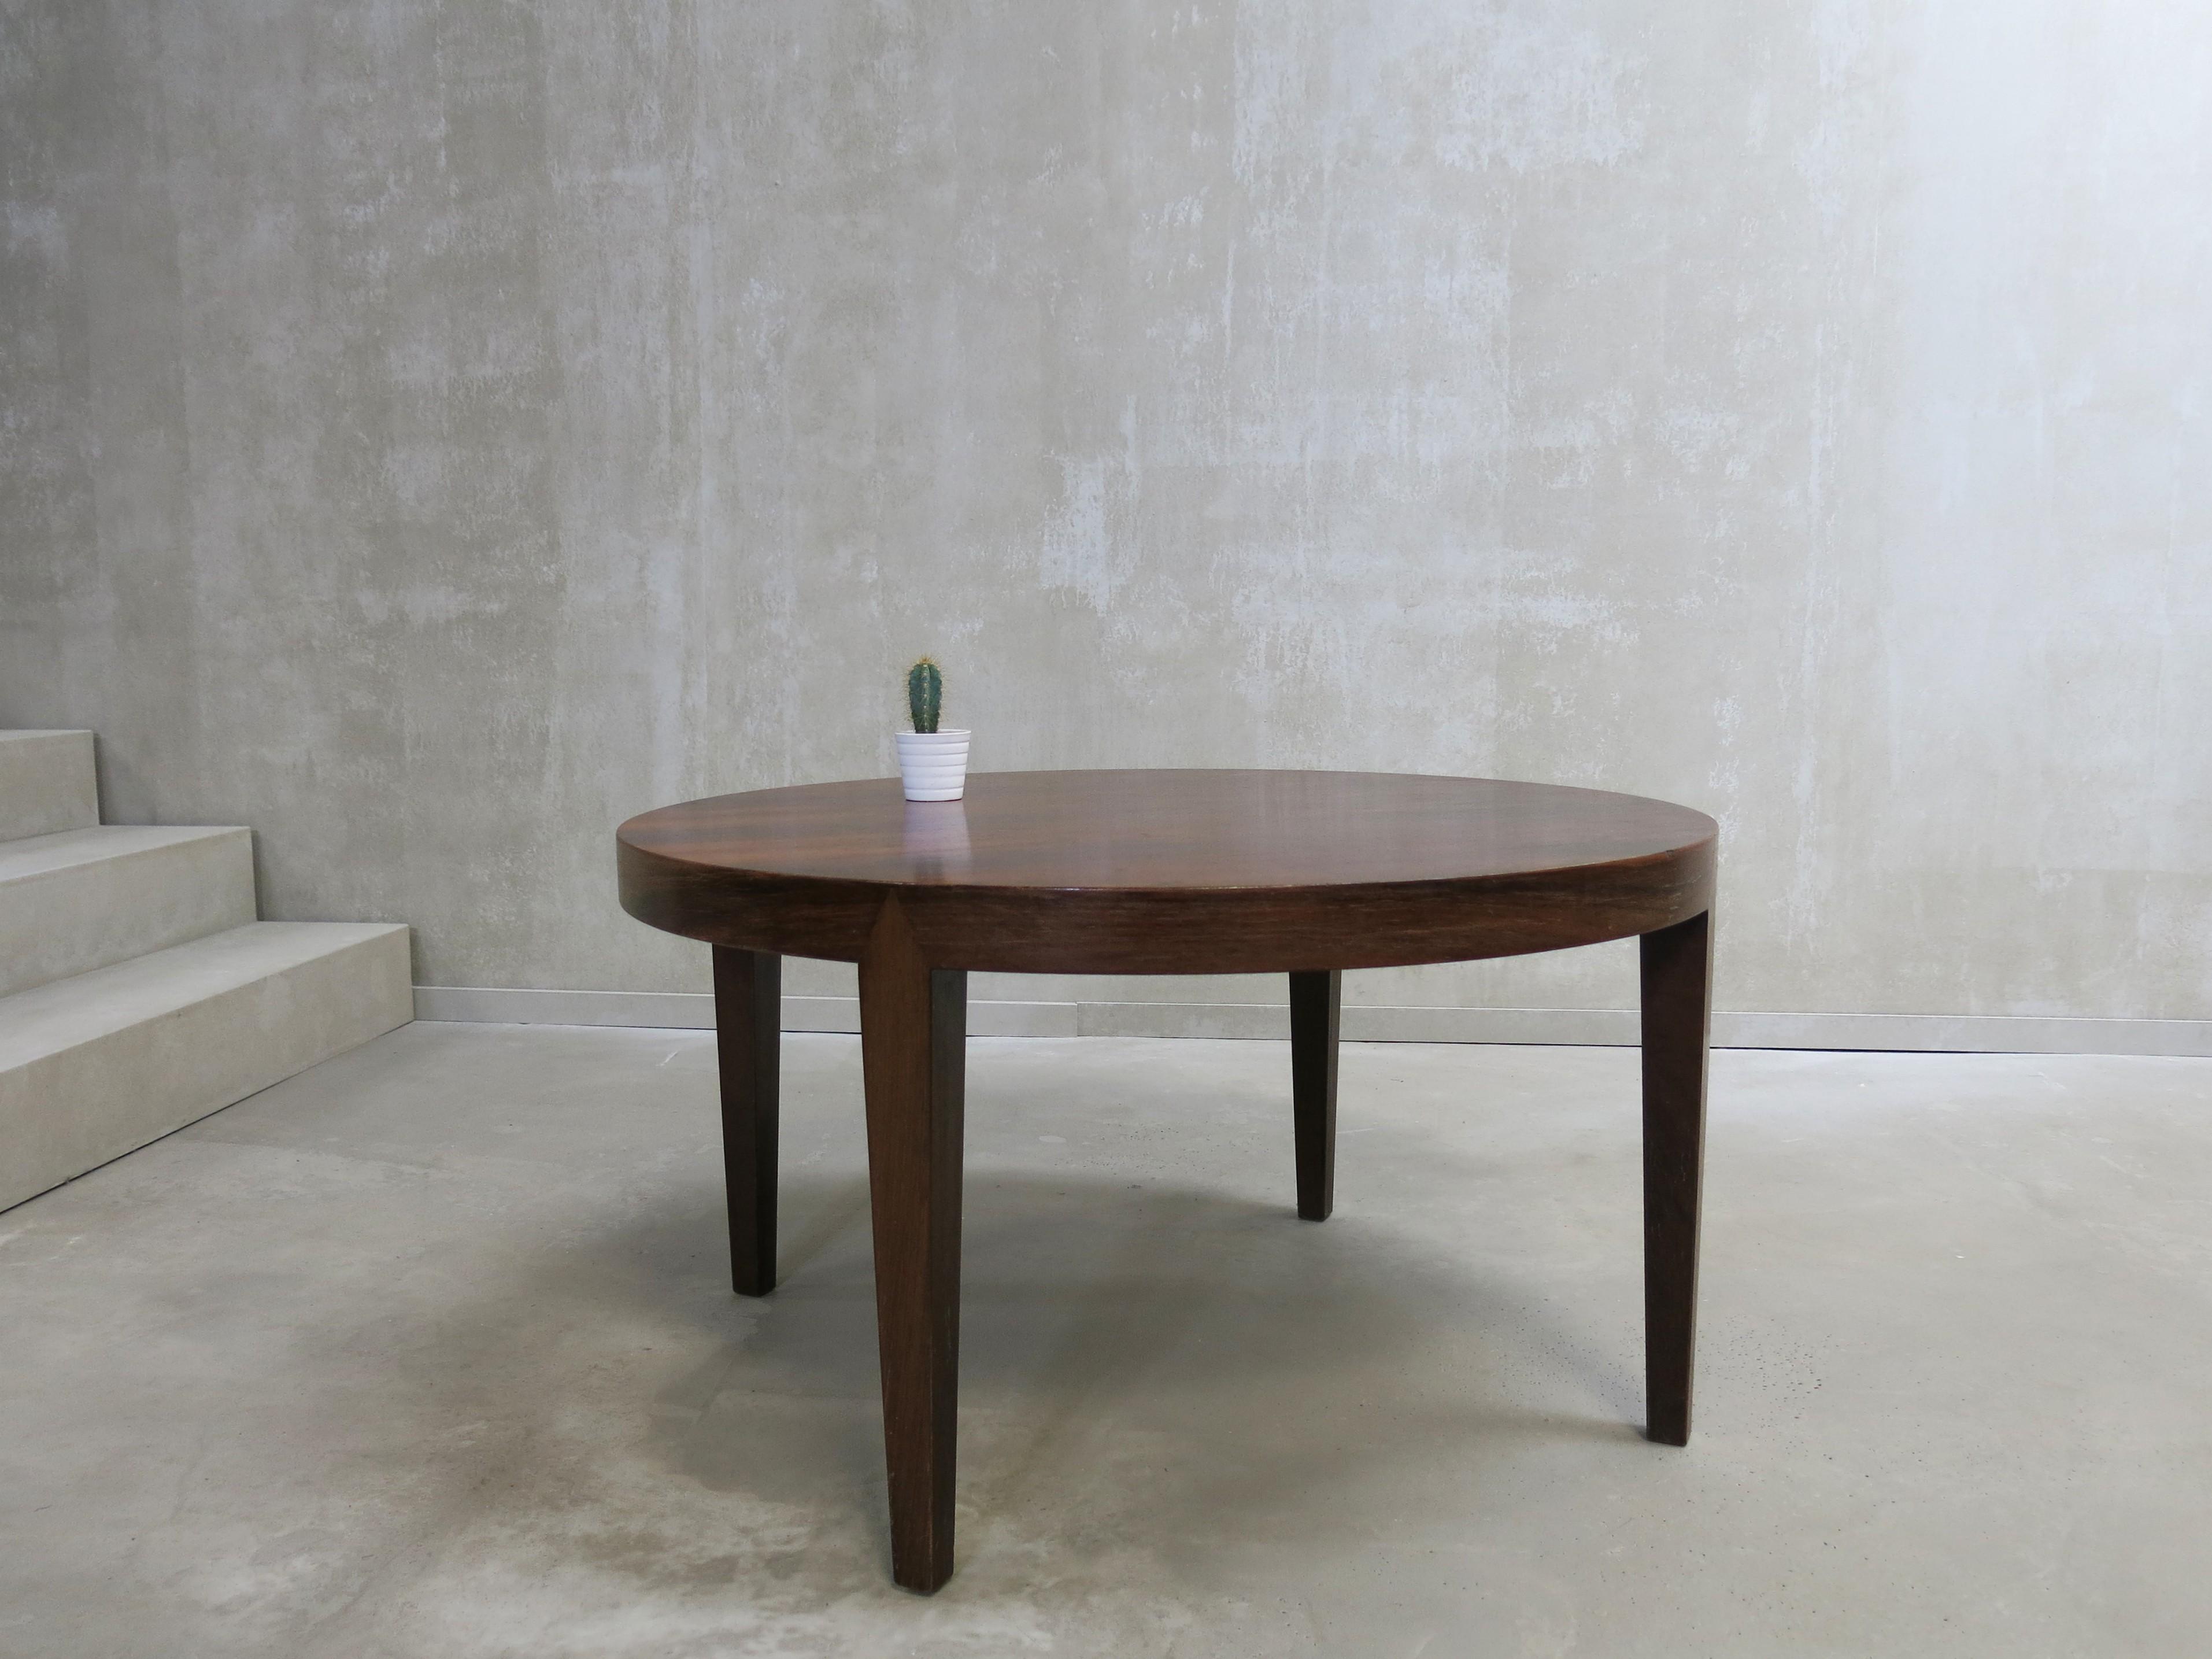 Vintage Danish Round Coffee Table 1960s Previous Next